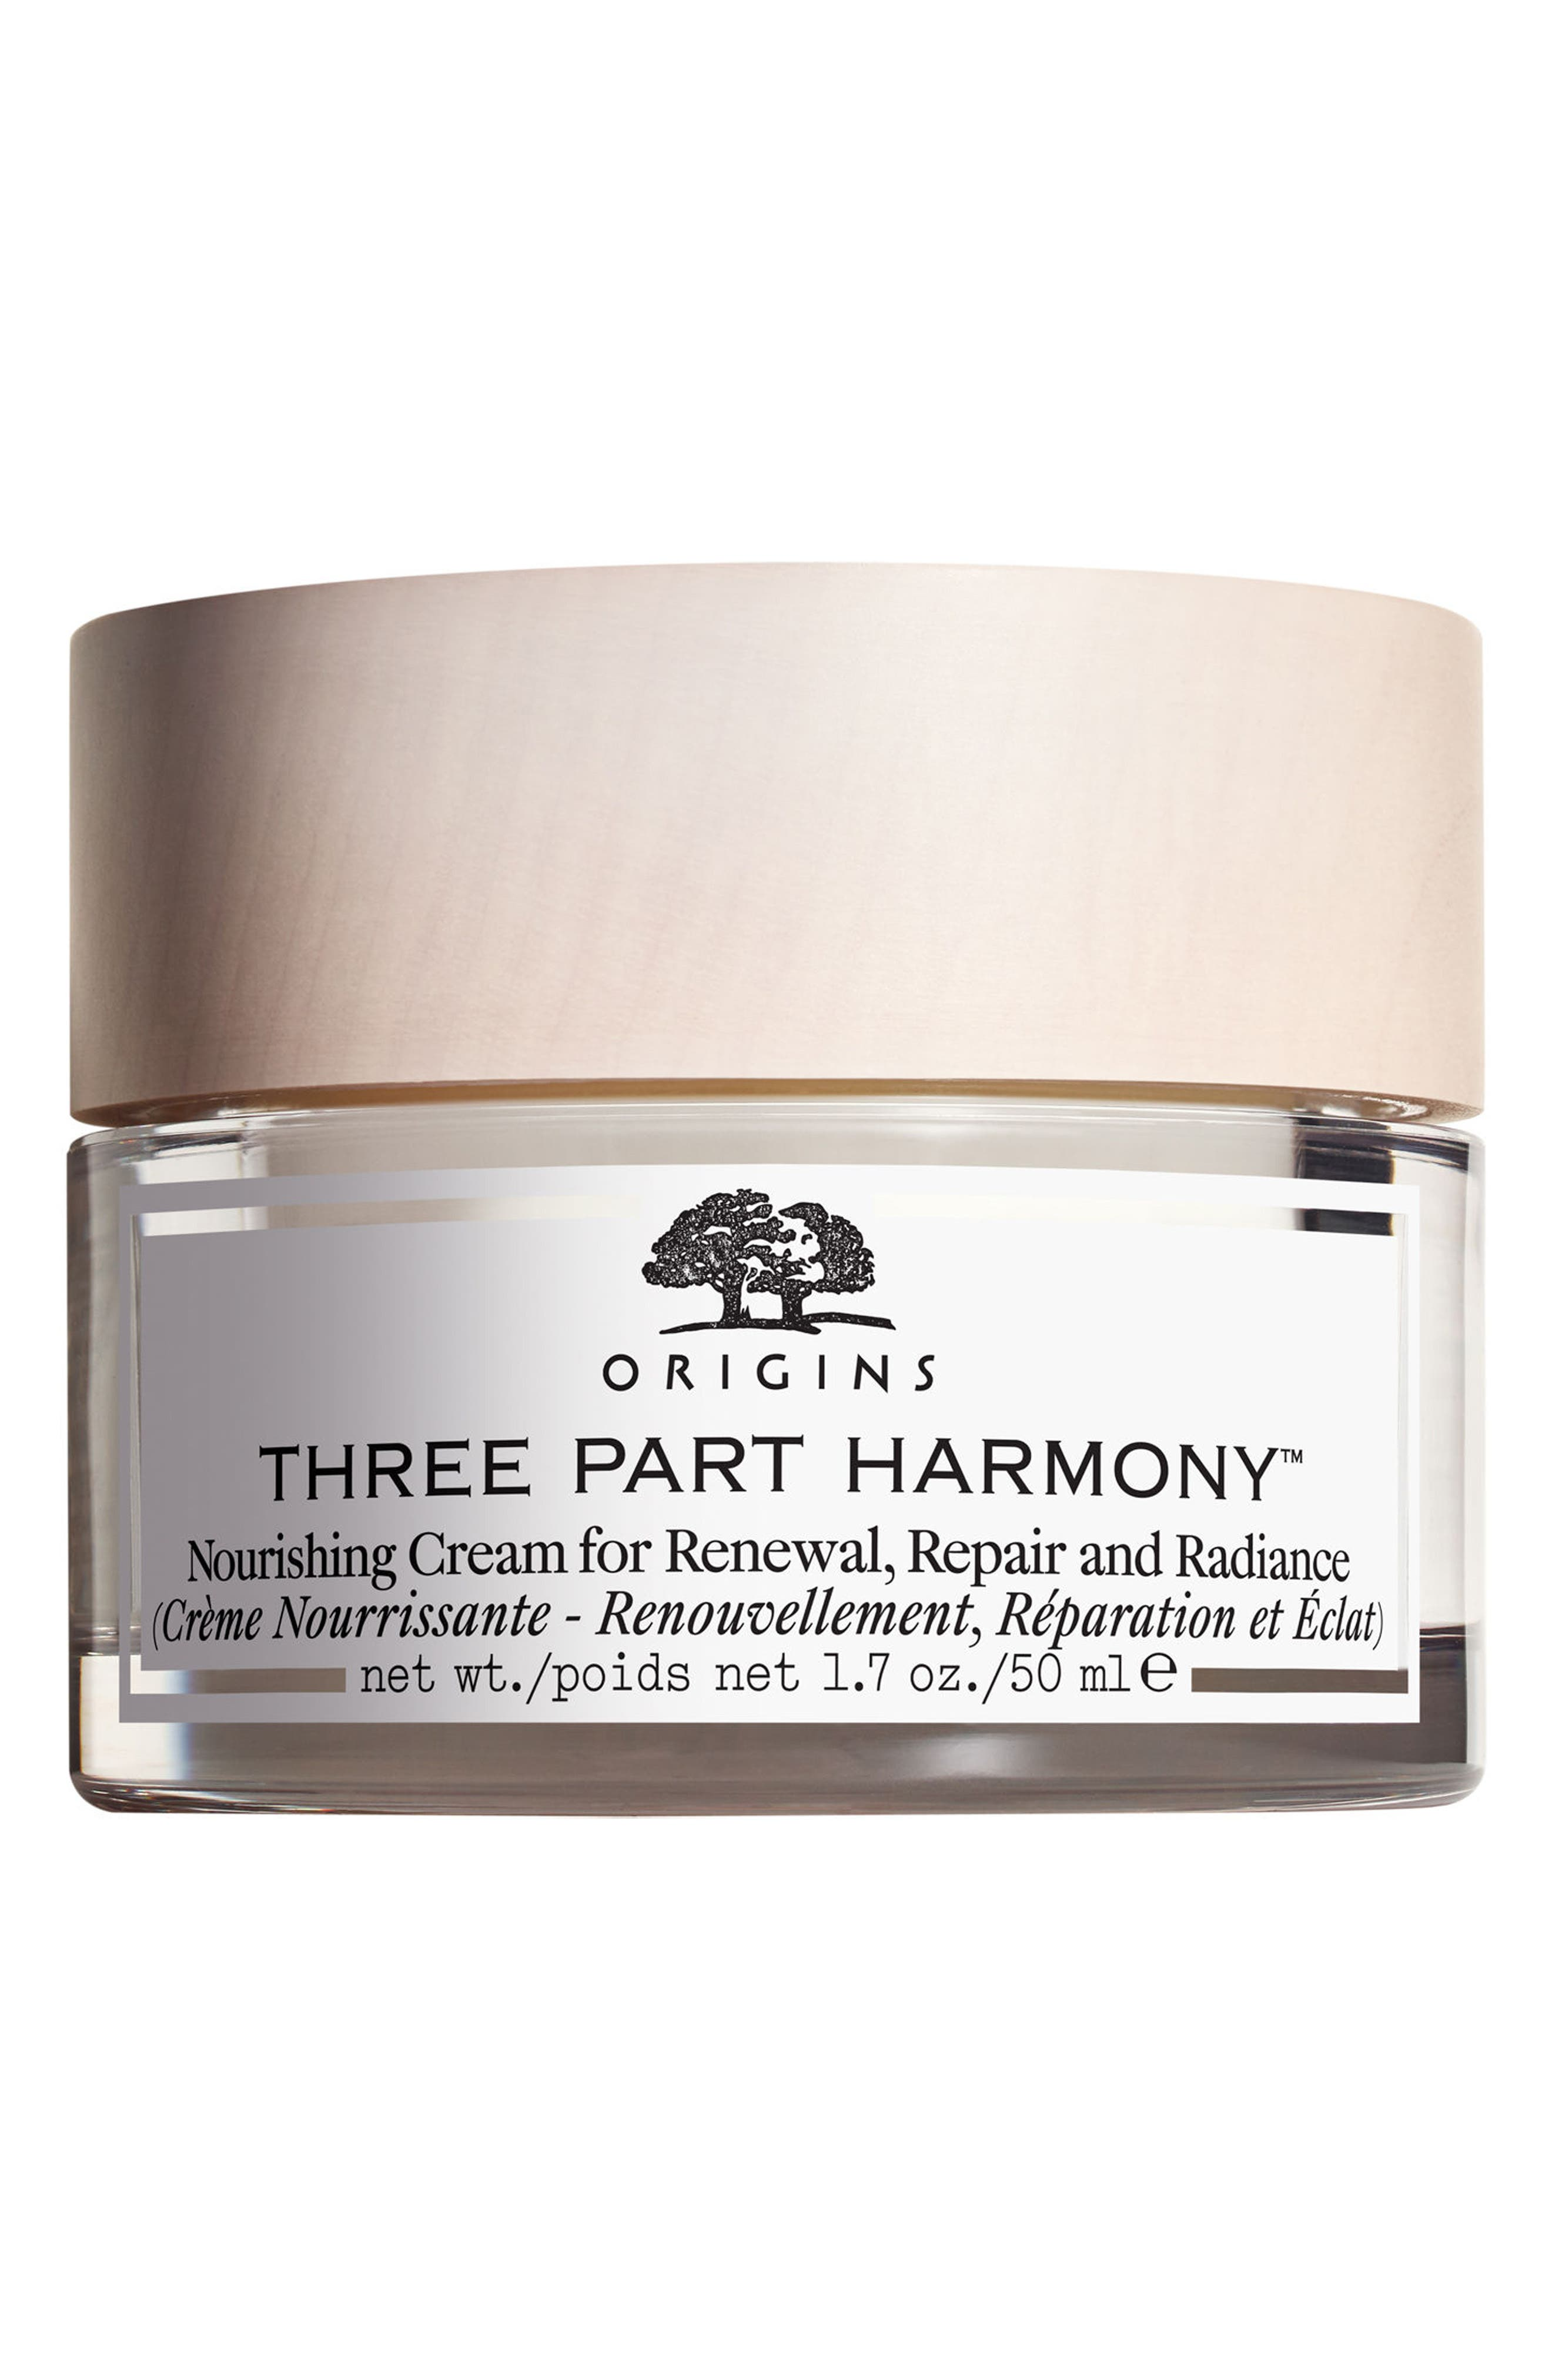 Origins Three-Part Harmony™ Nourishing Cream for Renewal, Repair & Radiance